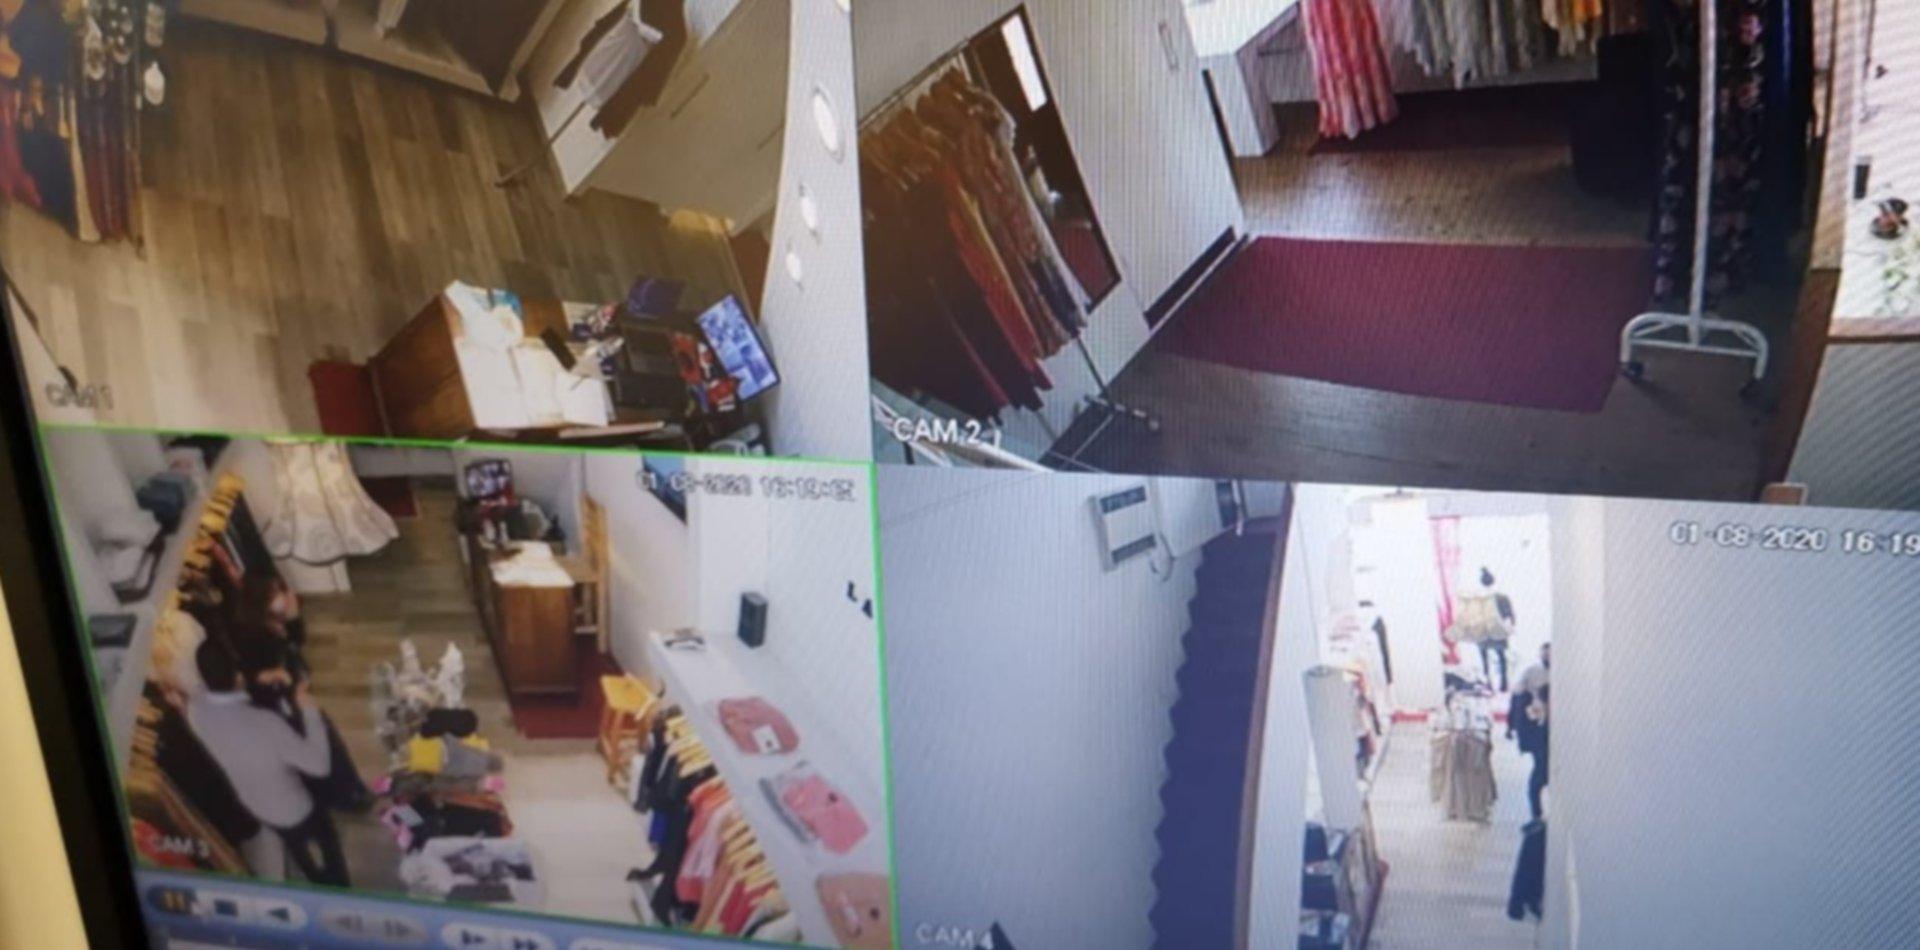 VIDEO: Se hizo pasar por un cliente y en segundo robó un celular en el local de Las Oreiro